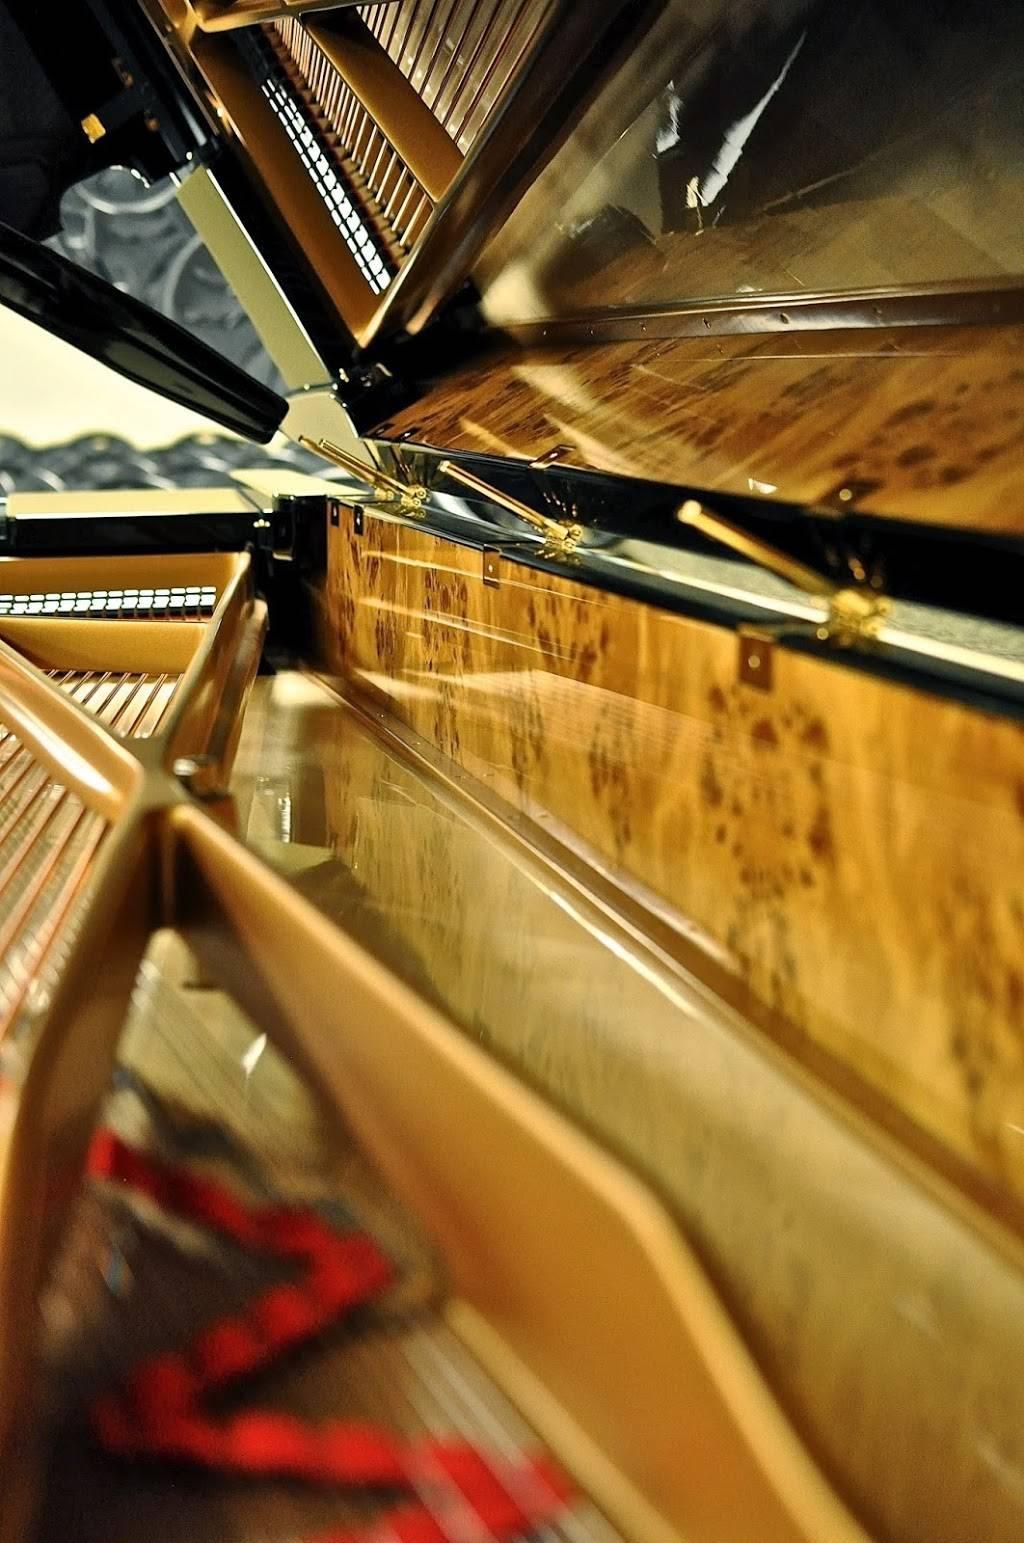 Portland Piano Company - electronics store  | Photo 3 of 9 | Address: 8700 NE Columbia Blvd, Portland, OR 97220, USA | Phone: (503) 775-2480